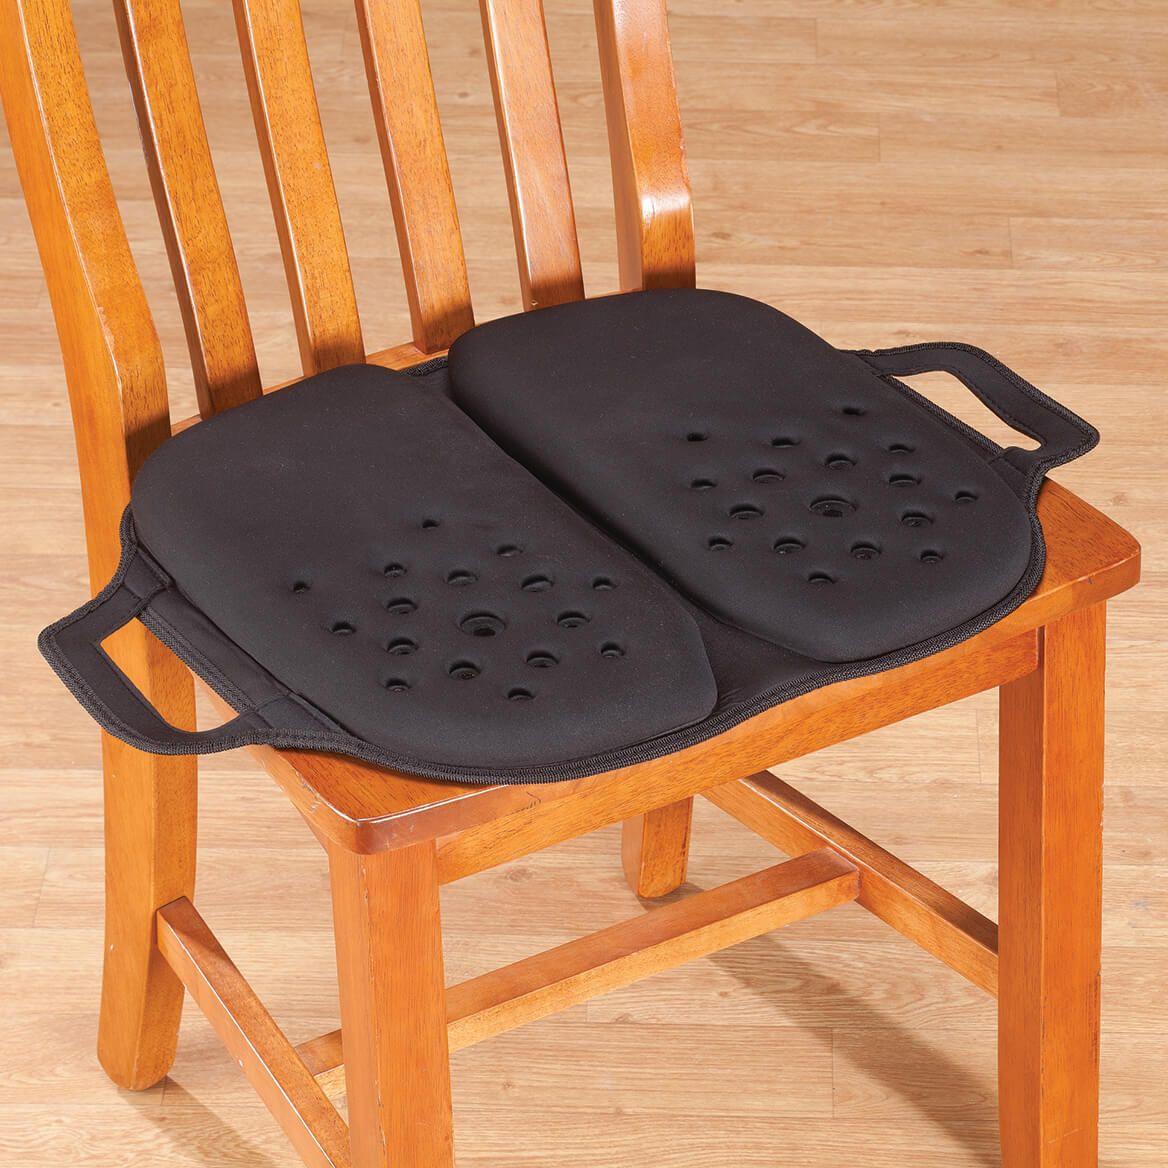 Compact Gel Seat Cushion-354001